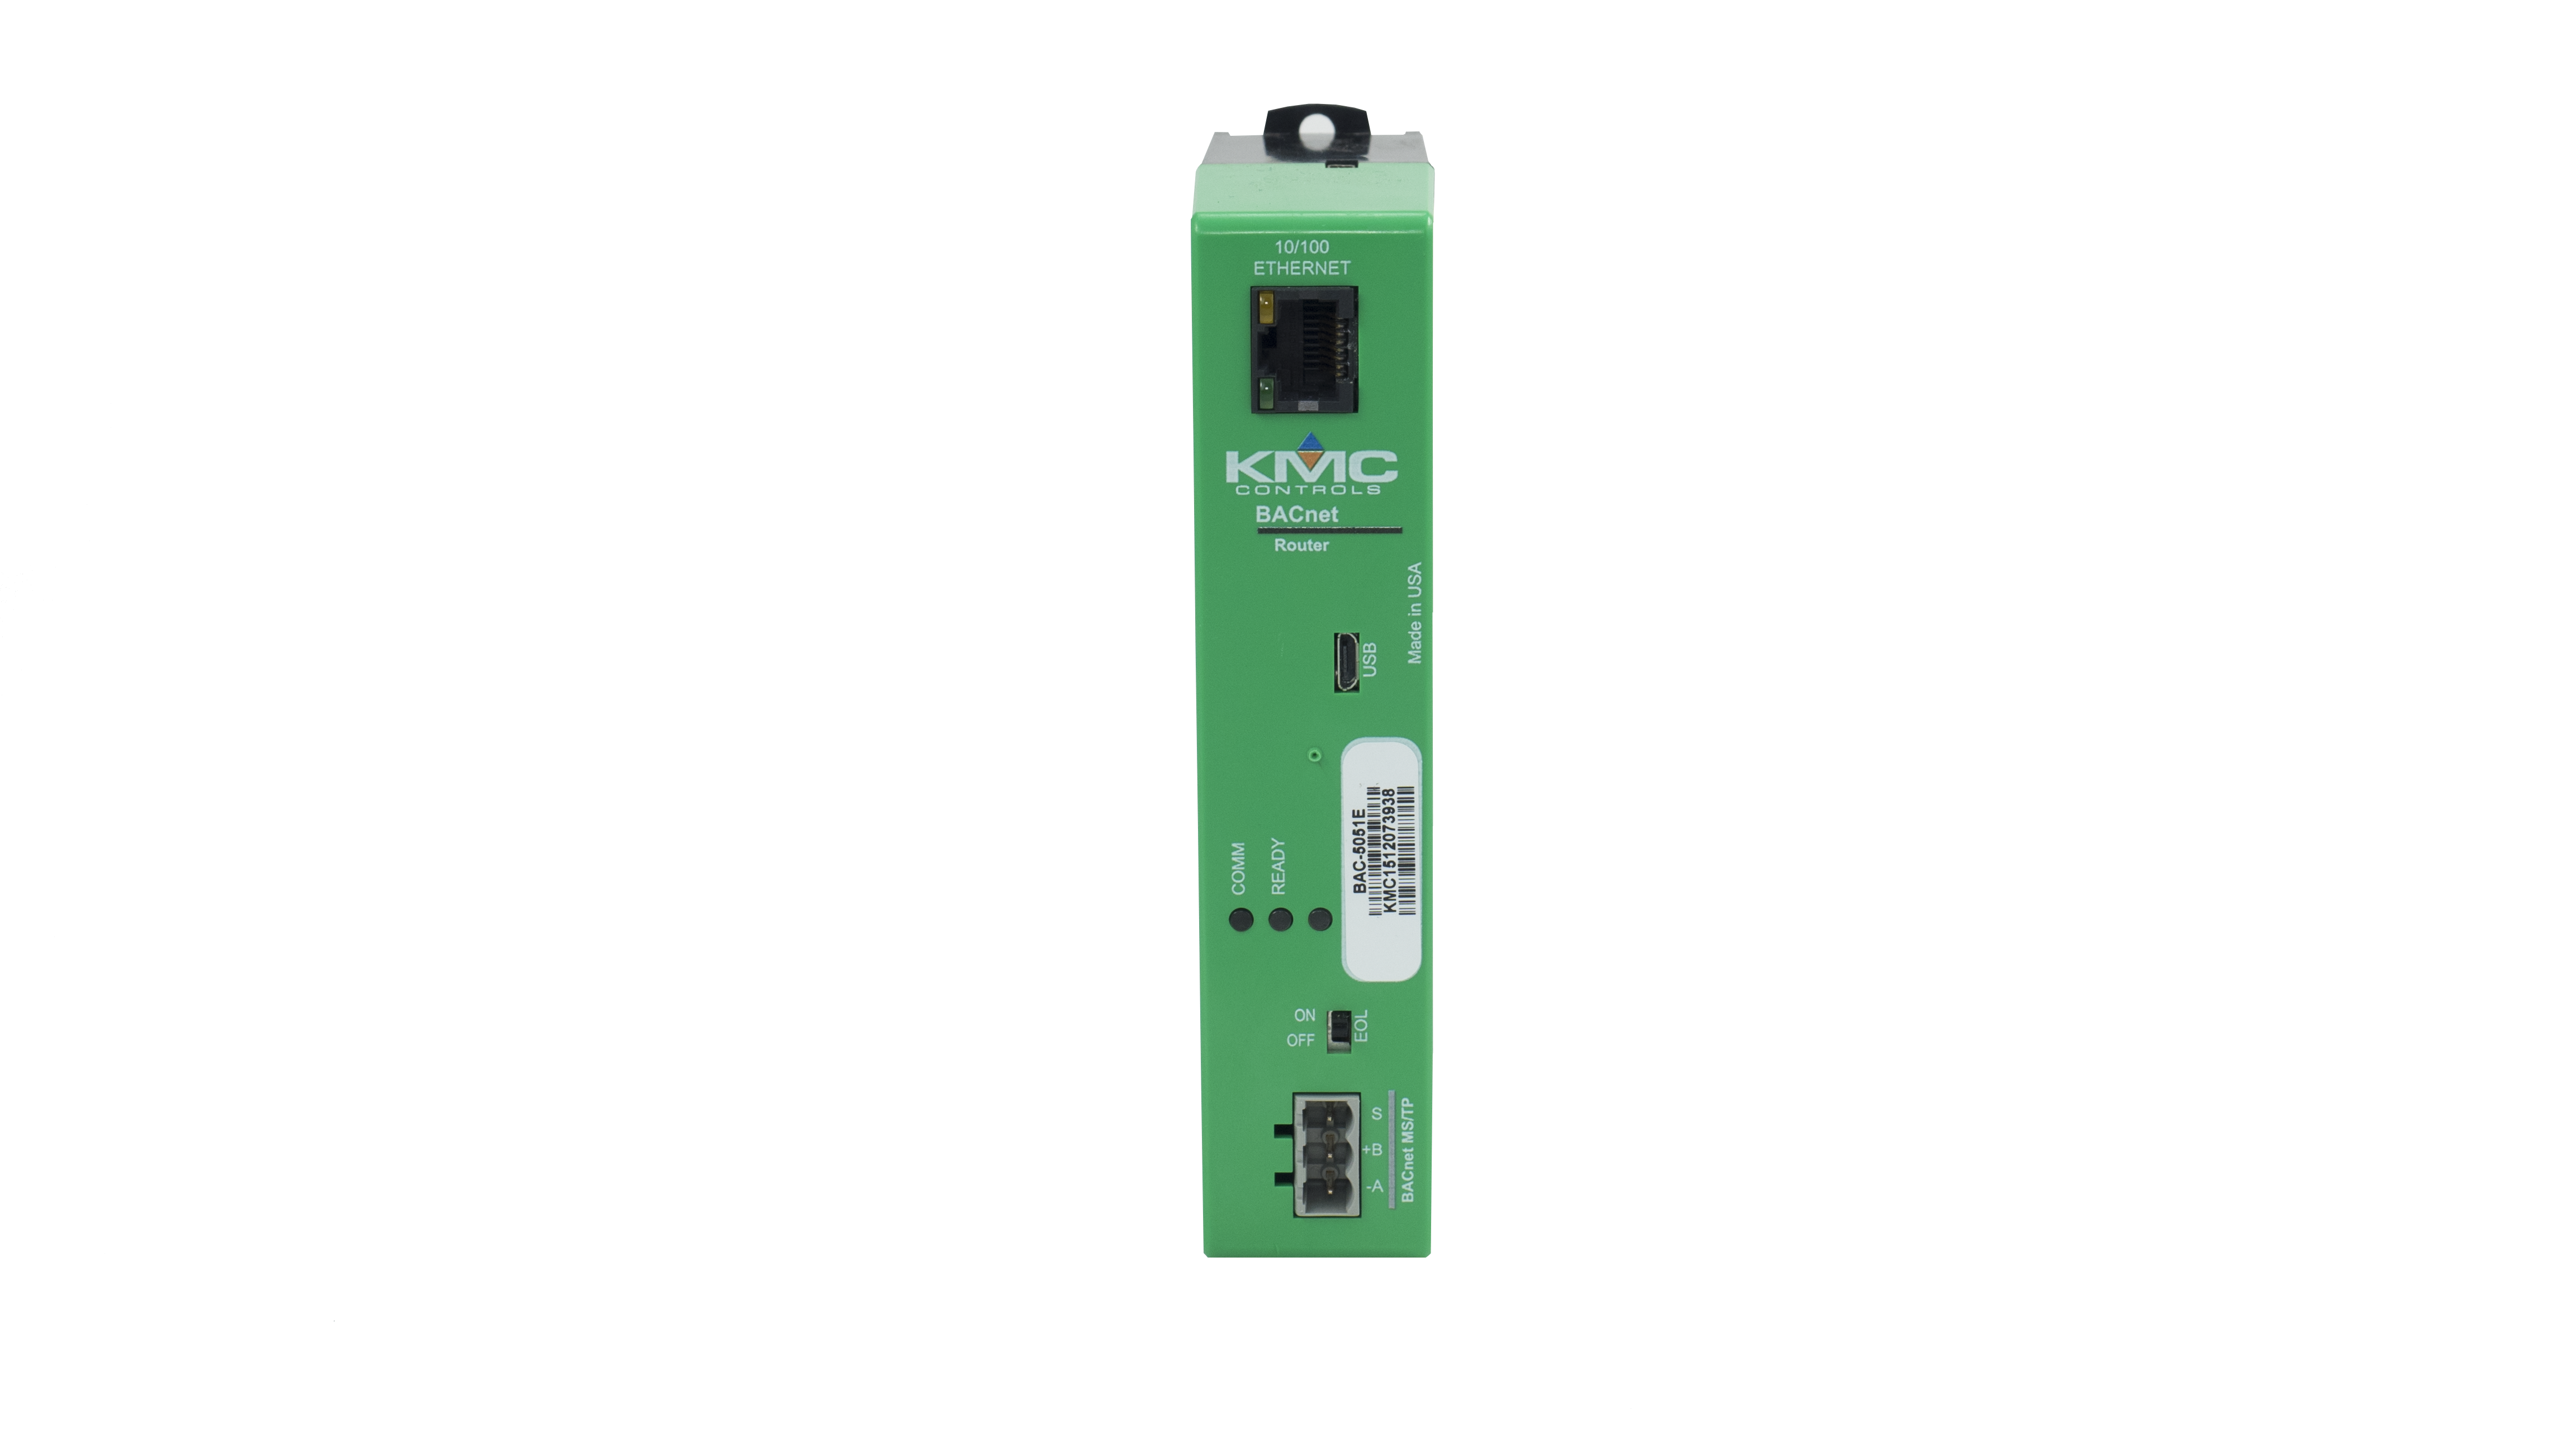 Router: BACnet, IP/Enet/Single MSTP | KMC Controls